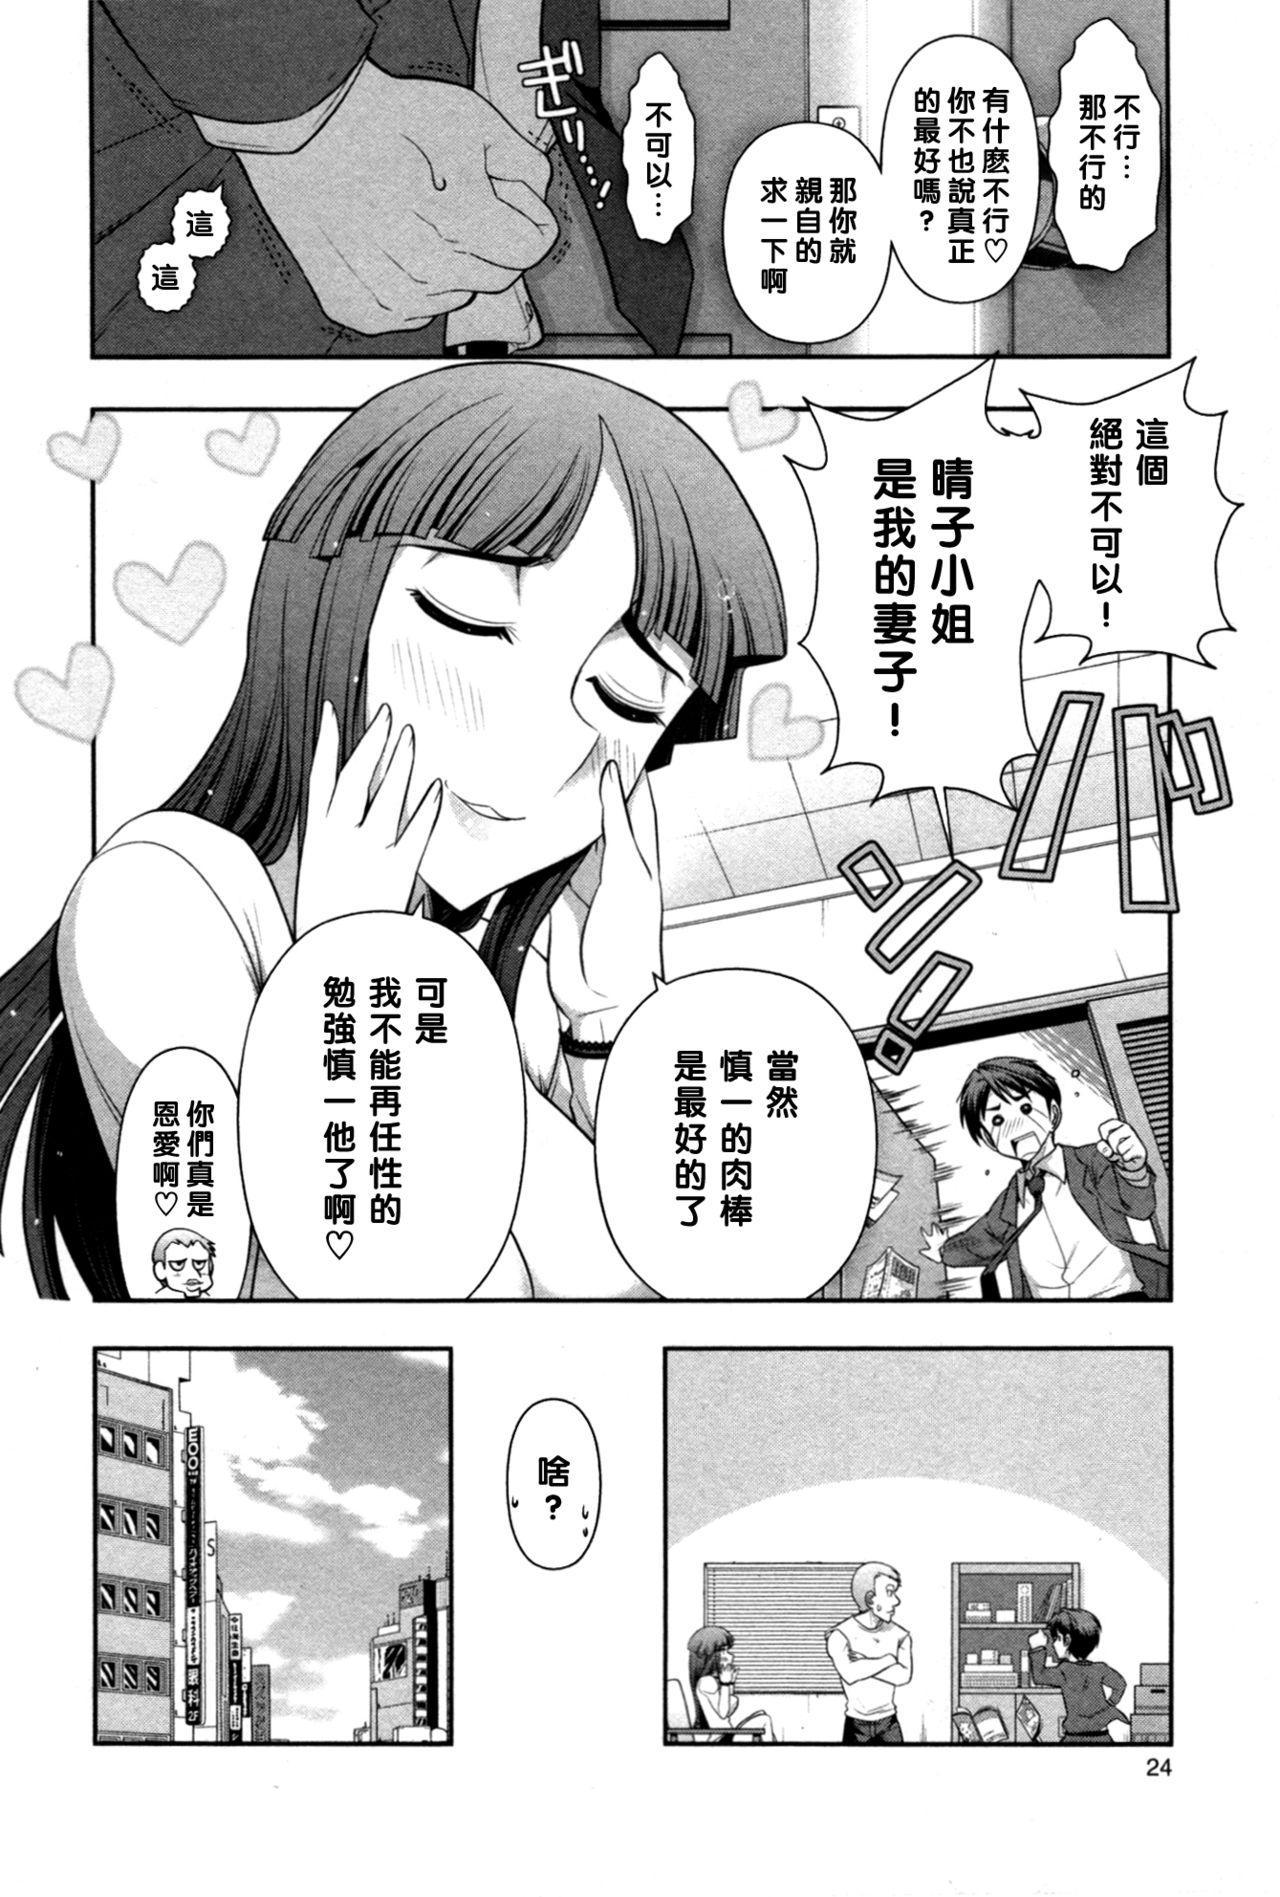 Haruko-san no Niizuma Recipe Ch. 2 9